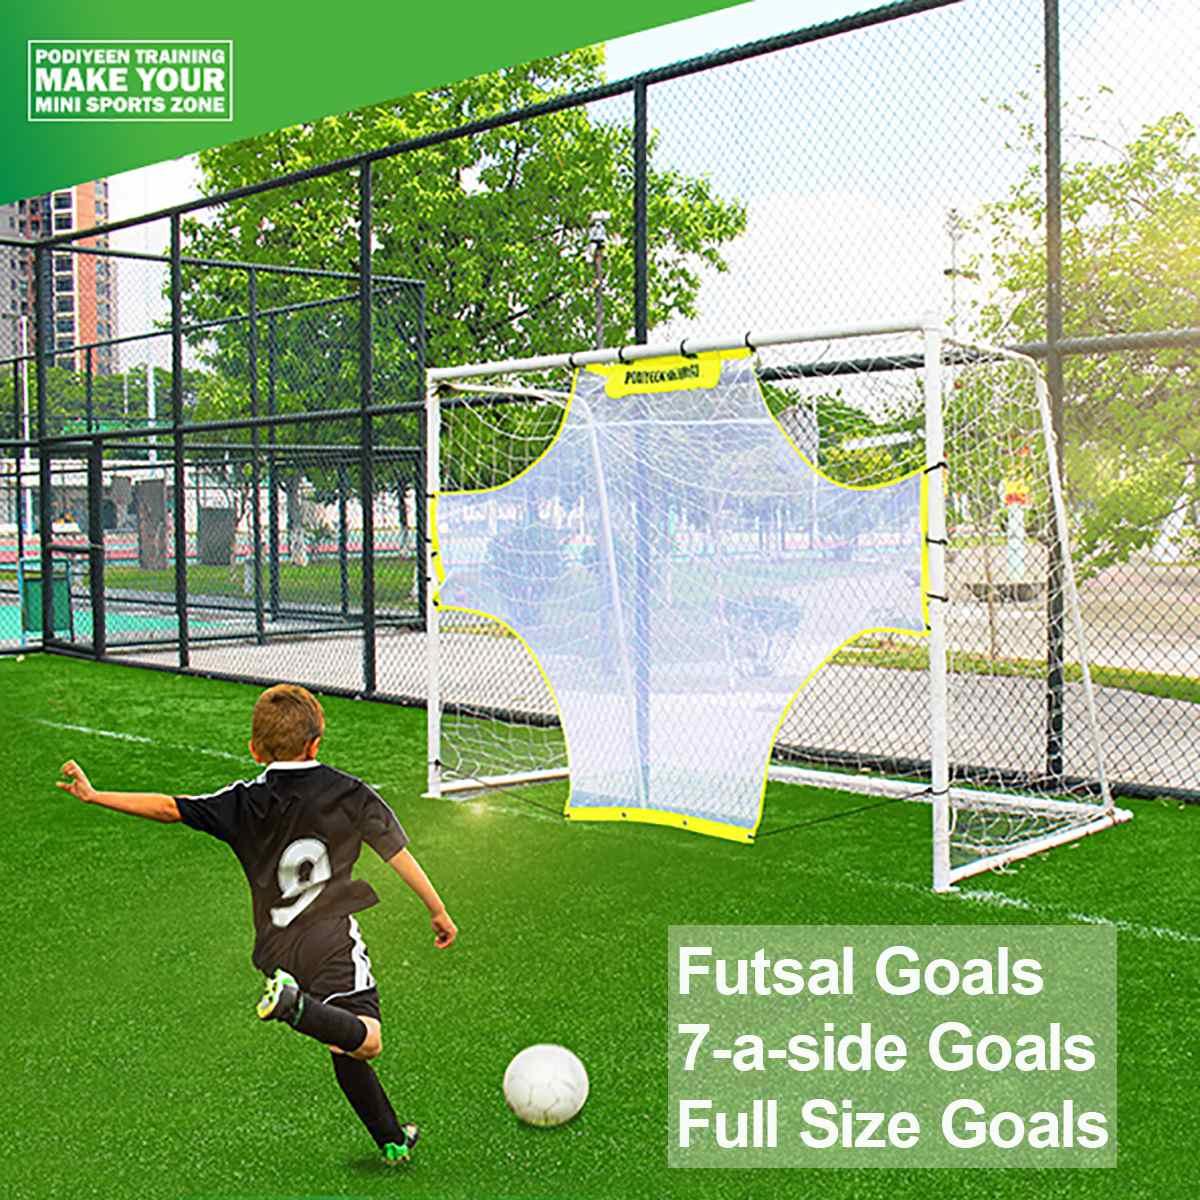 Soccer Target Practice Training Shot Goal Net Portable Ball Football Coach Tool Futsal 7-a-side Full Size Goals Nets